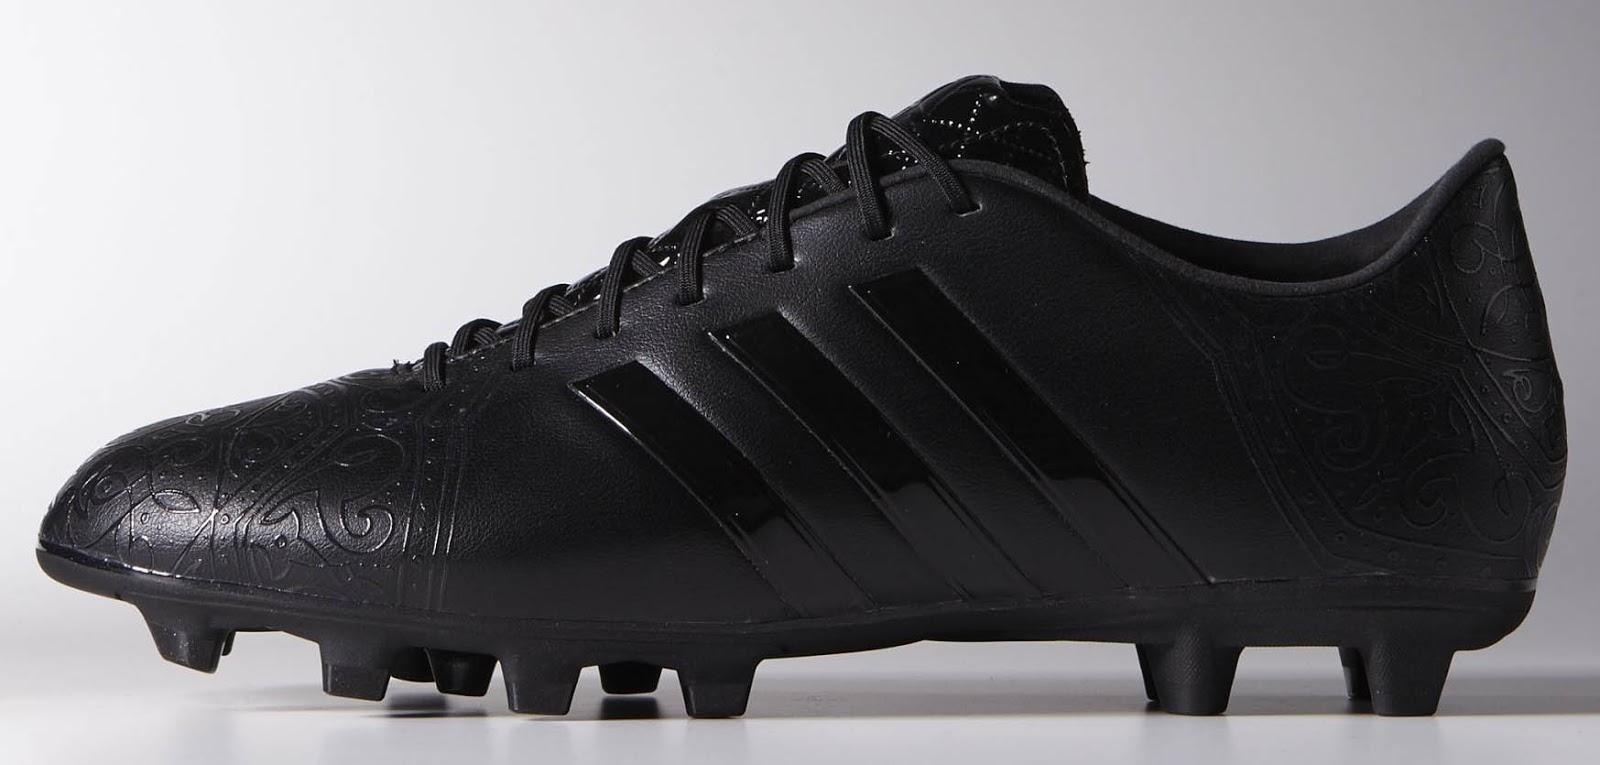 8e9832272 where to buy adidas 11pro knight pack fg blackout 77ced f4ba5  discount adidas  adipure 11pro black pack black black 721f1 64ca2